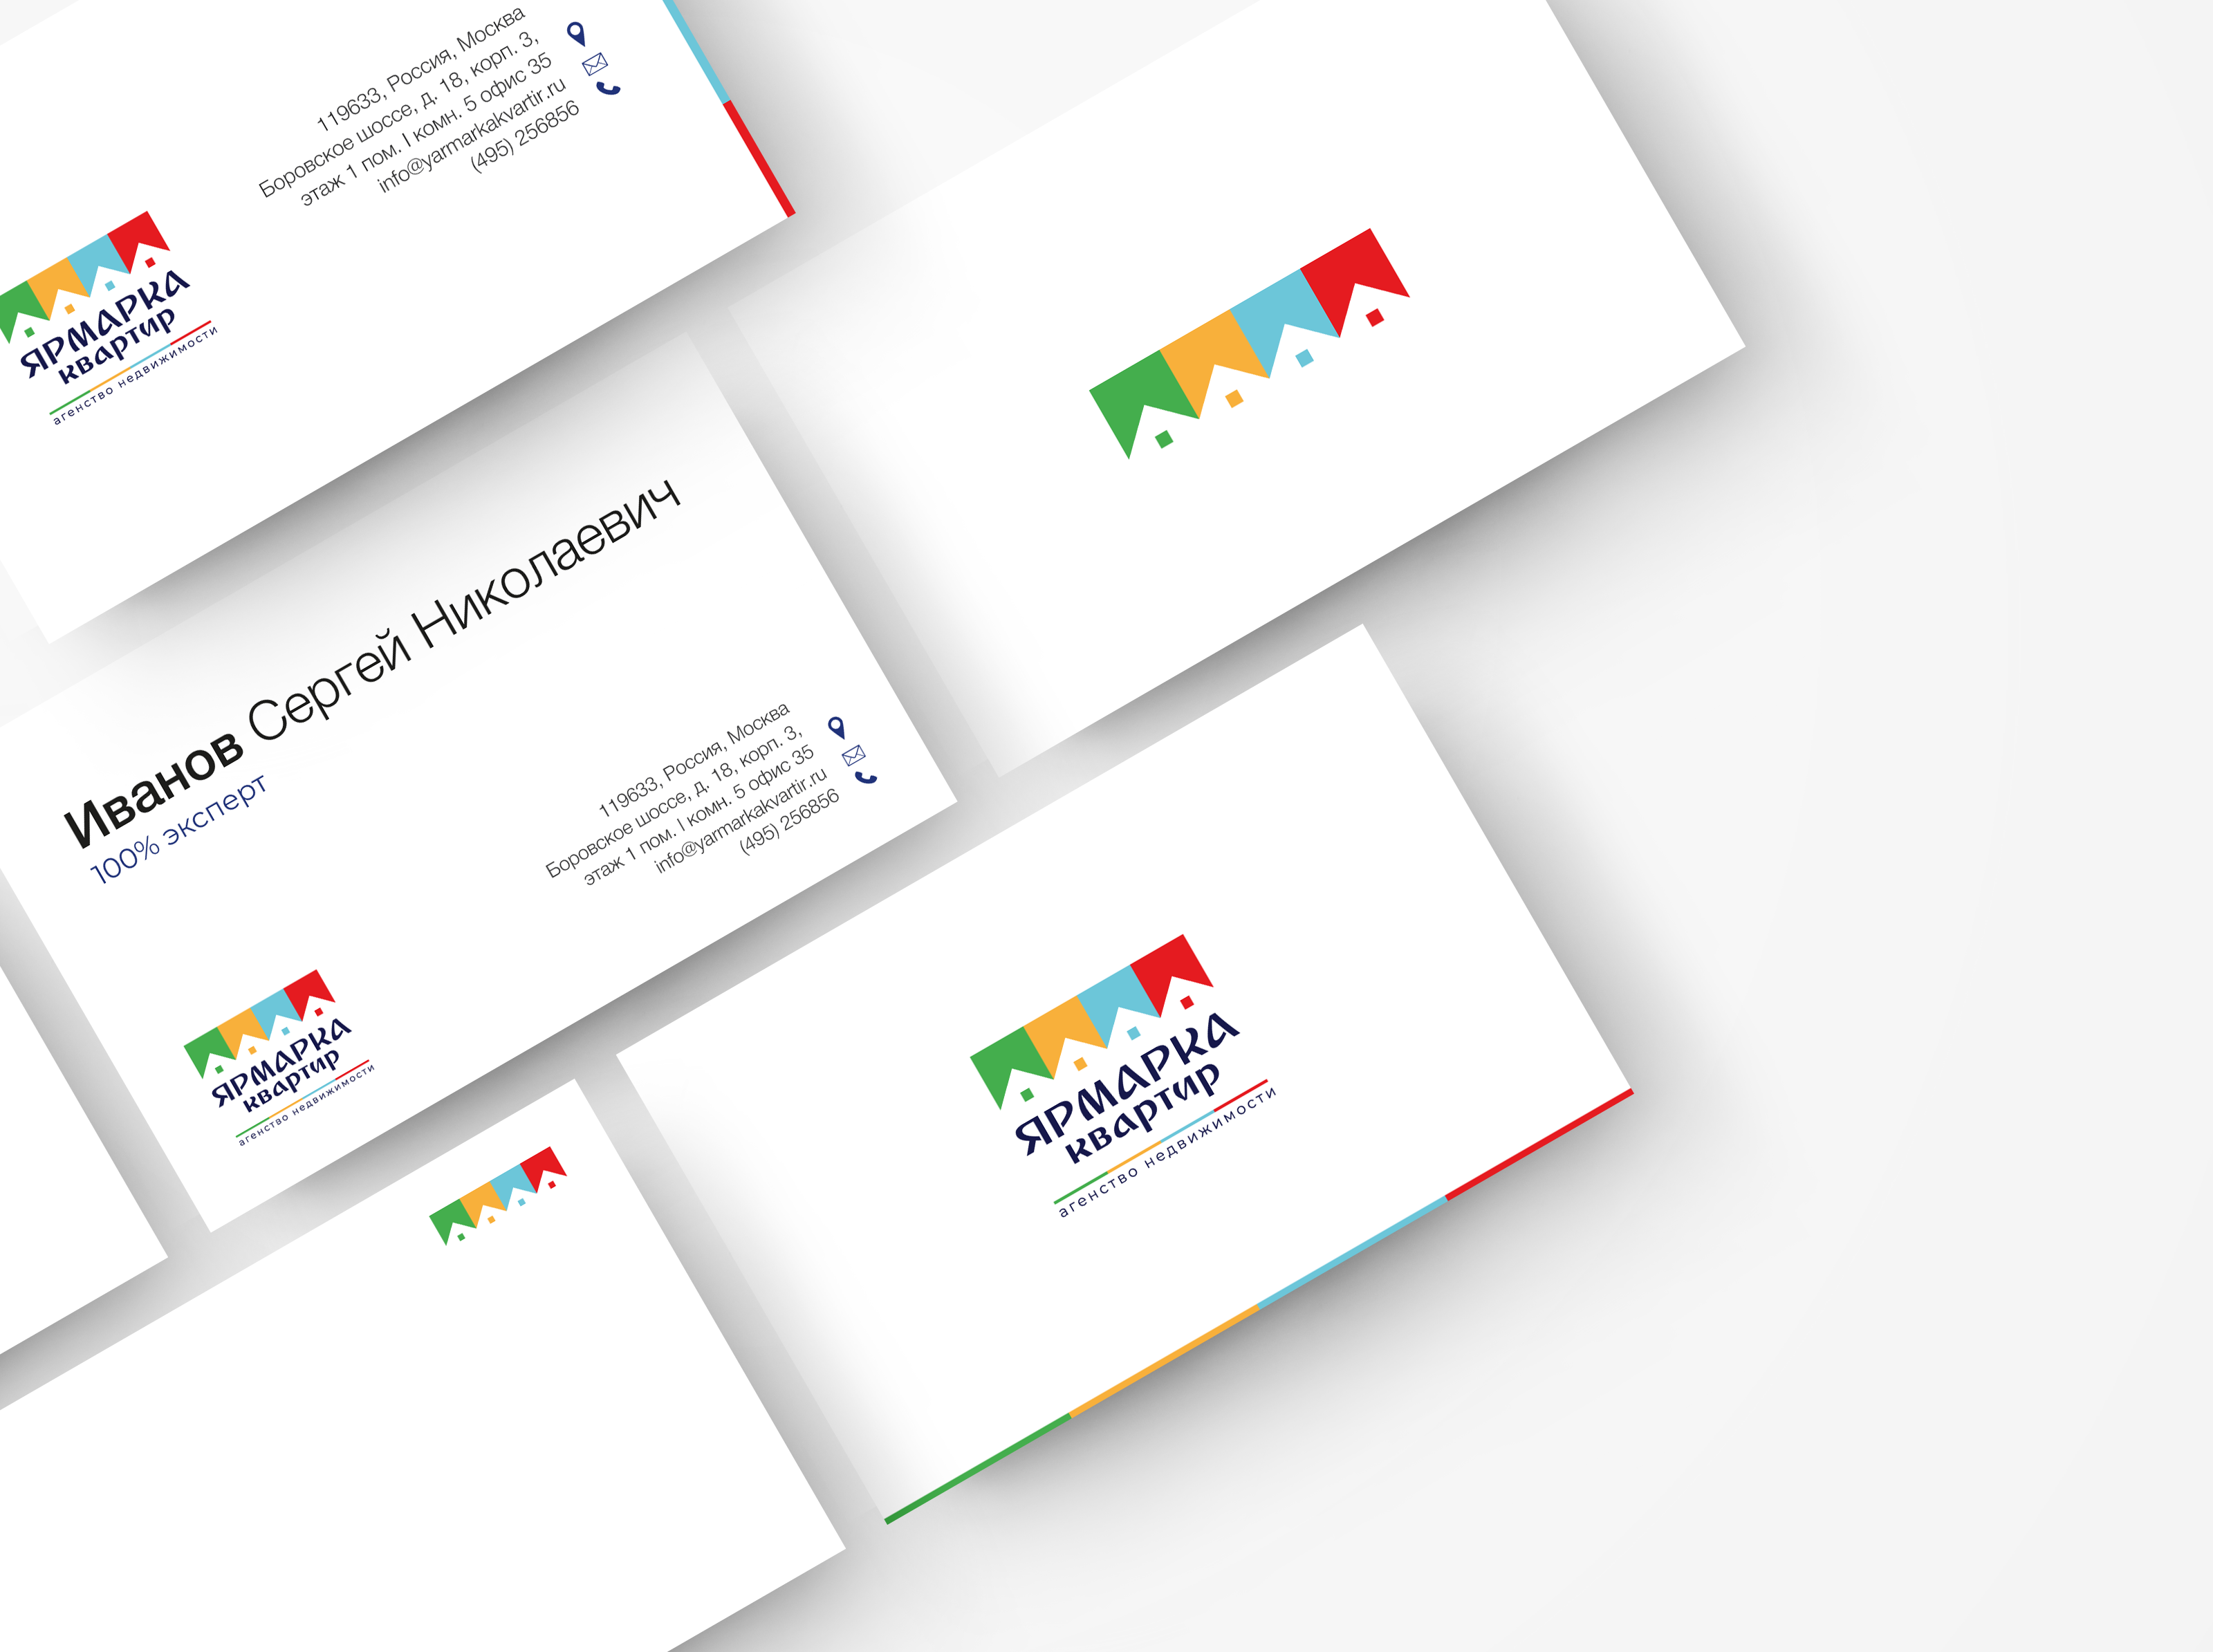 Создание логотипа, с вариантами для визитки и листовки фото f_127600b2245c1c7b.png